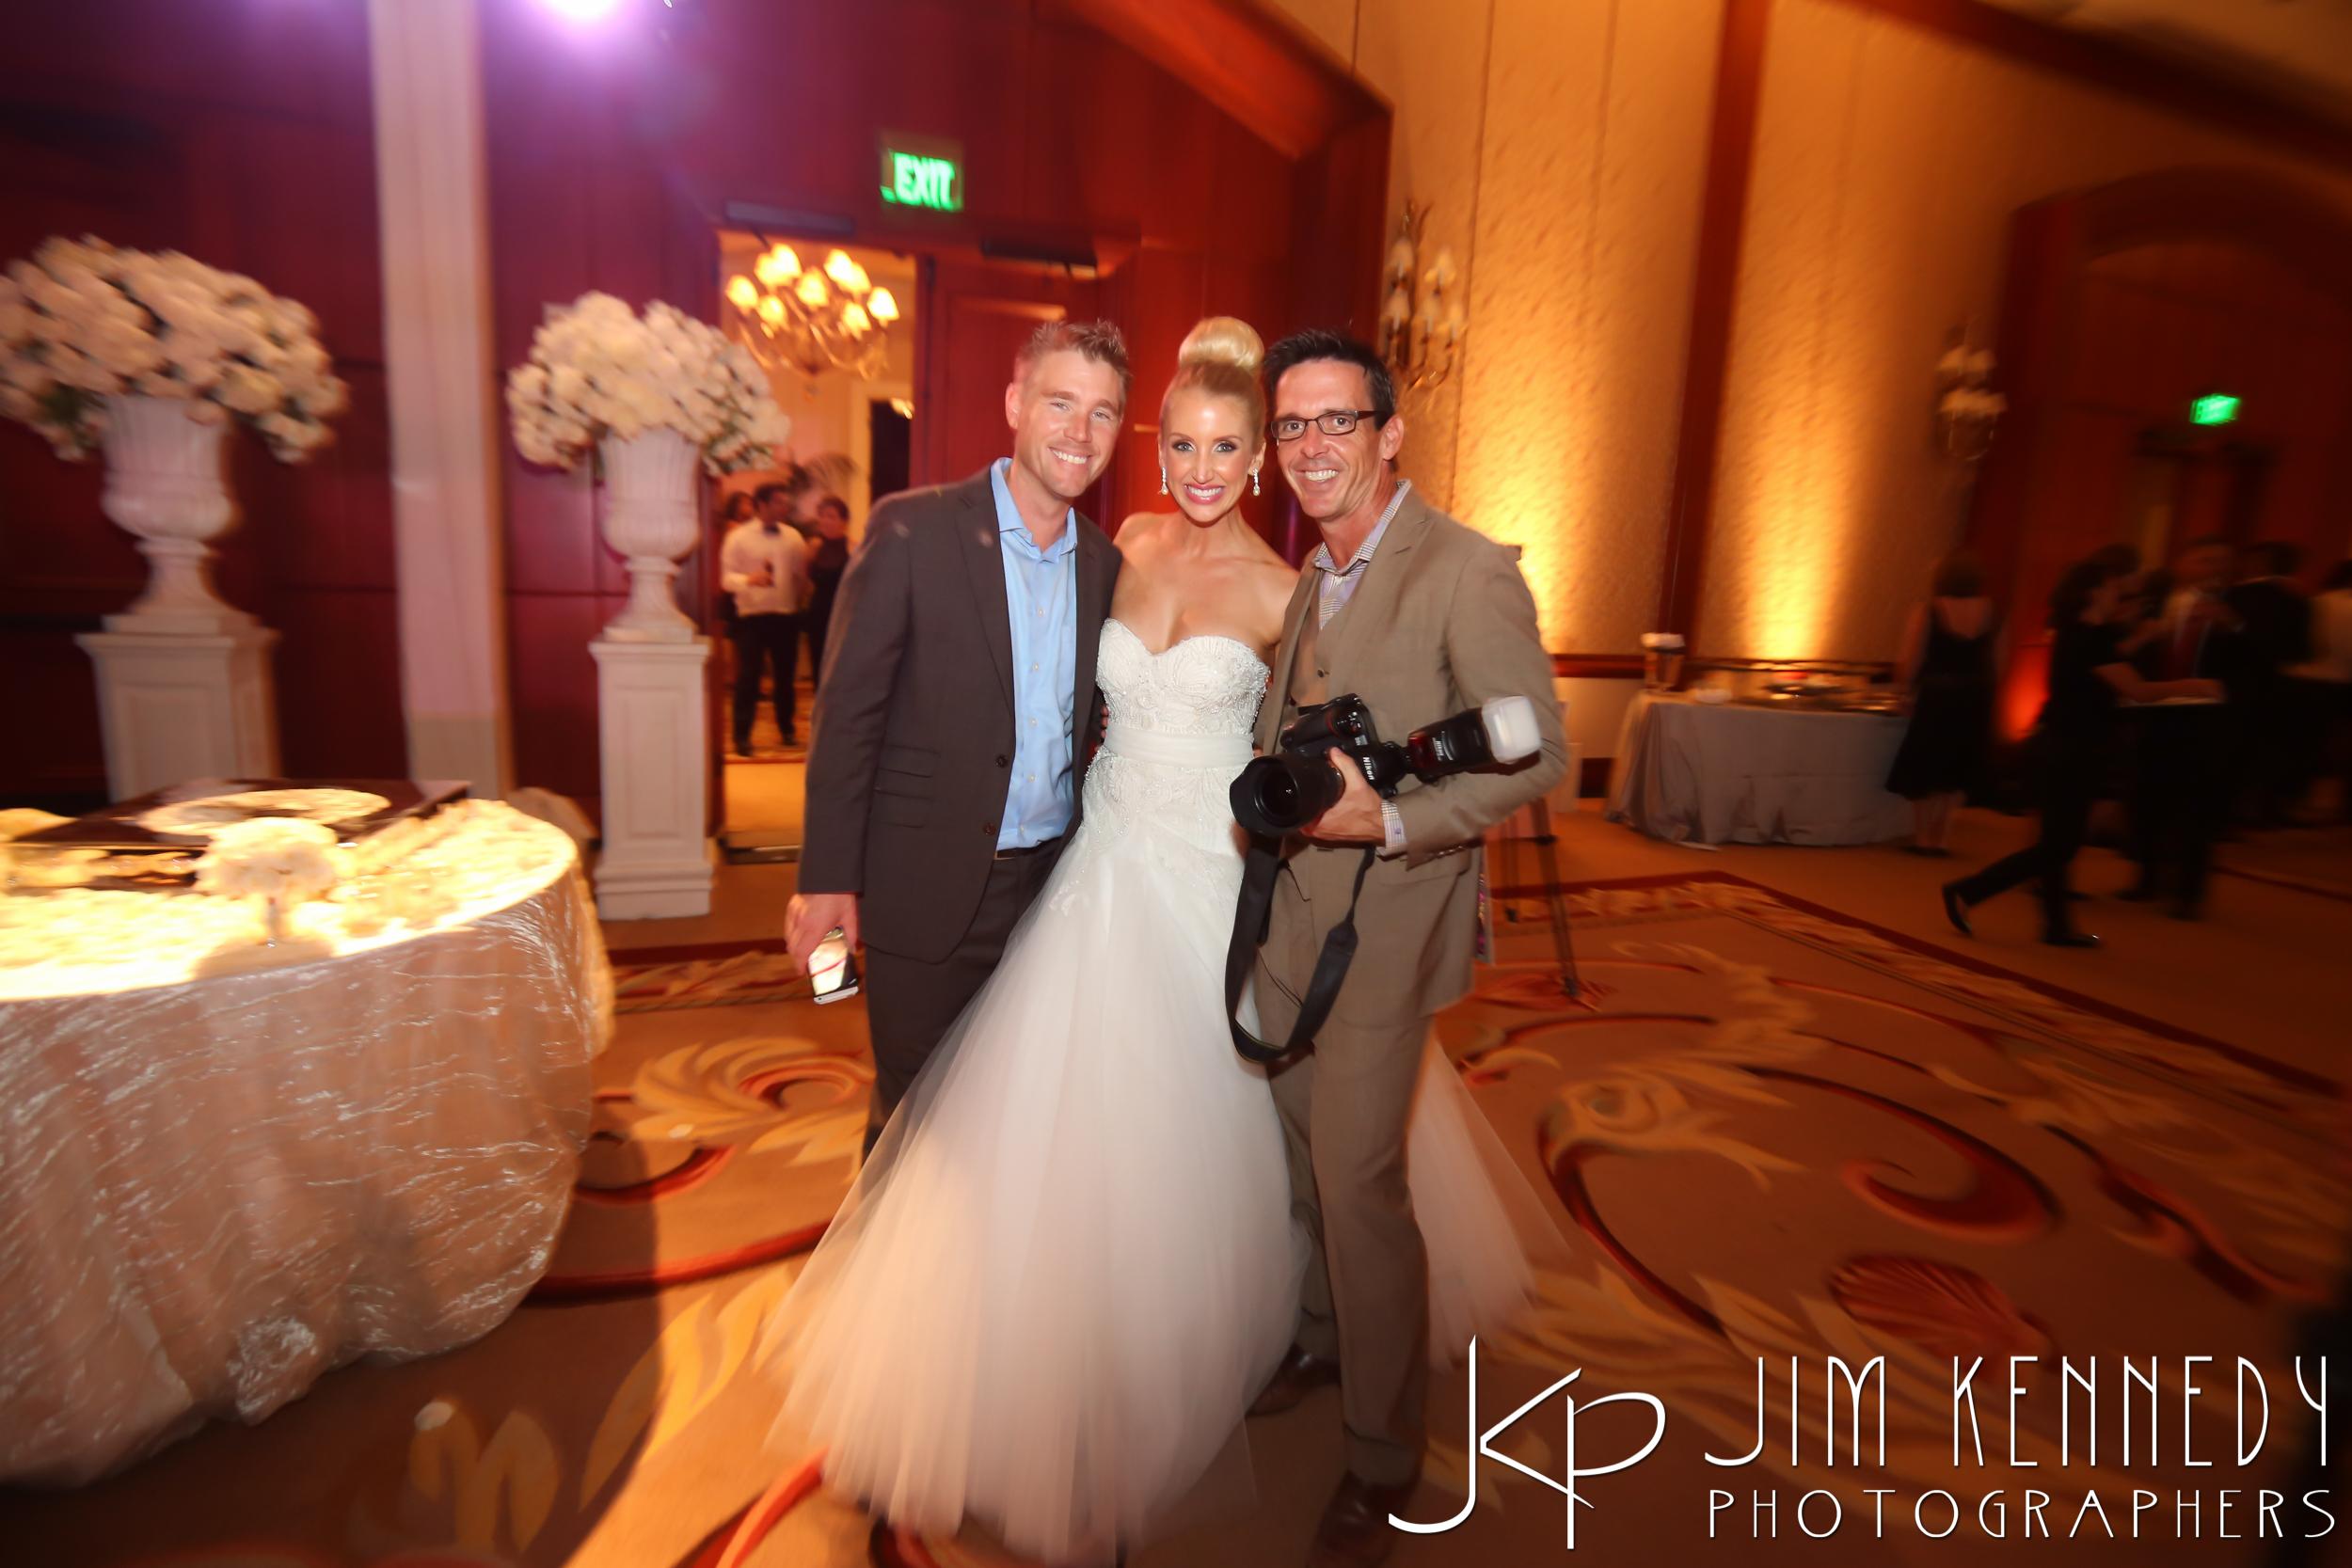 balboa-bay-resort-wedding-photography_0245.JPG